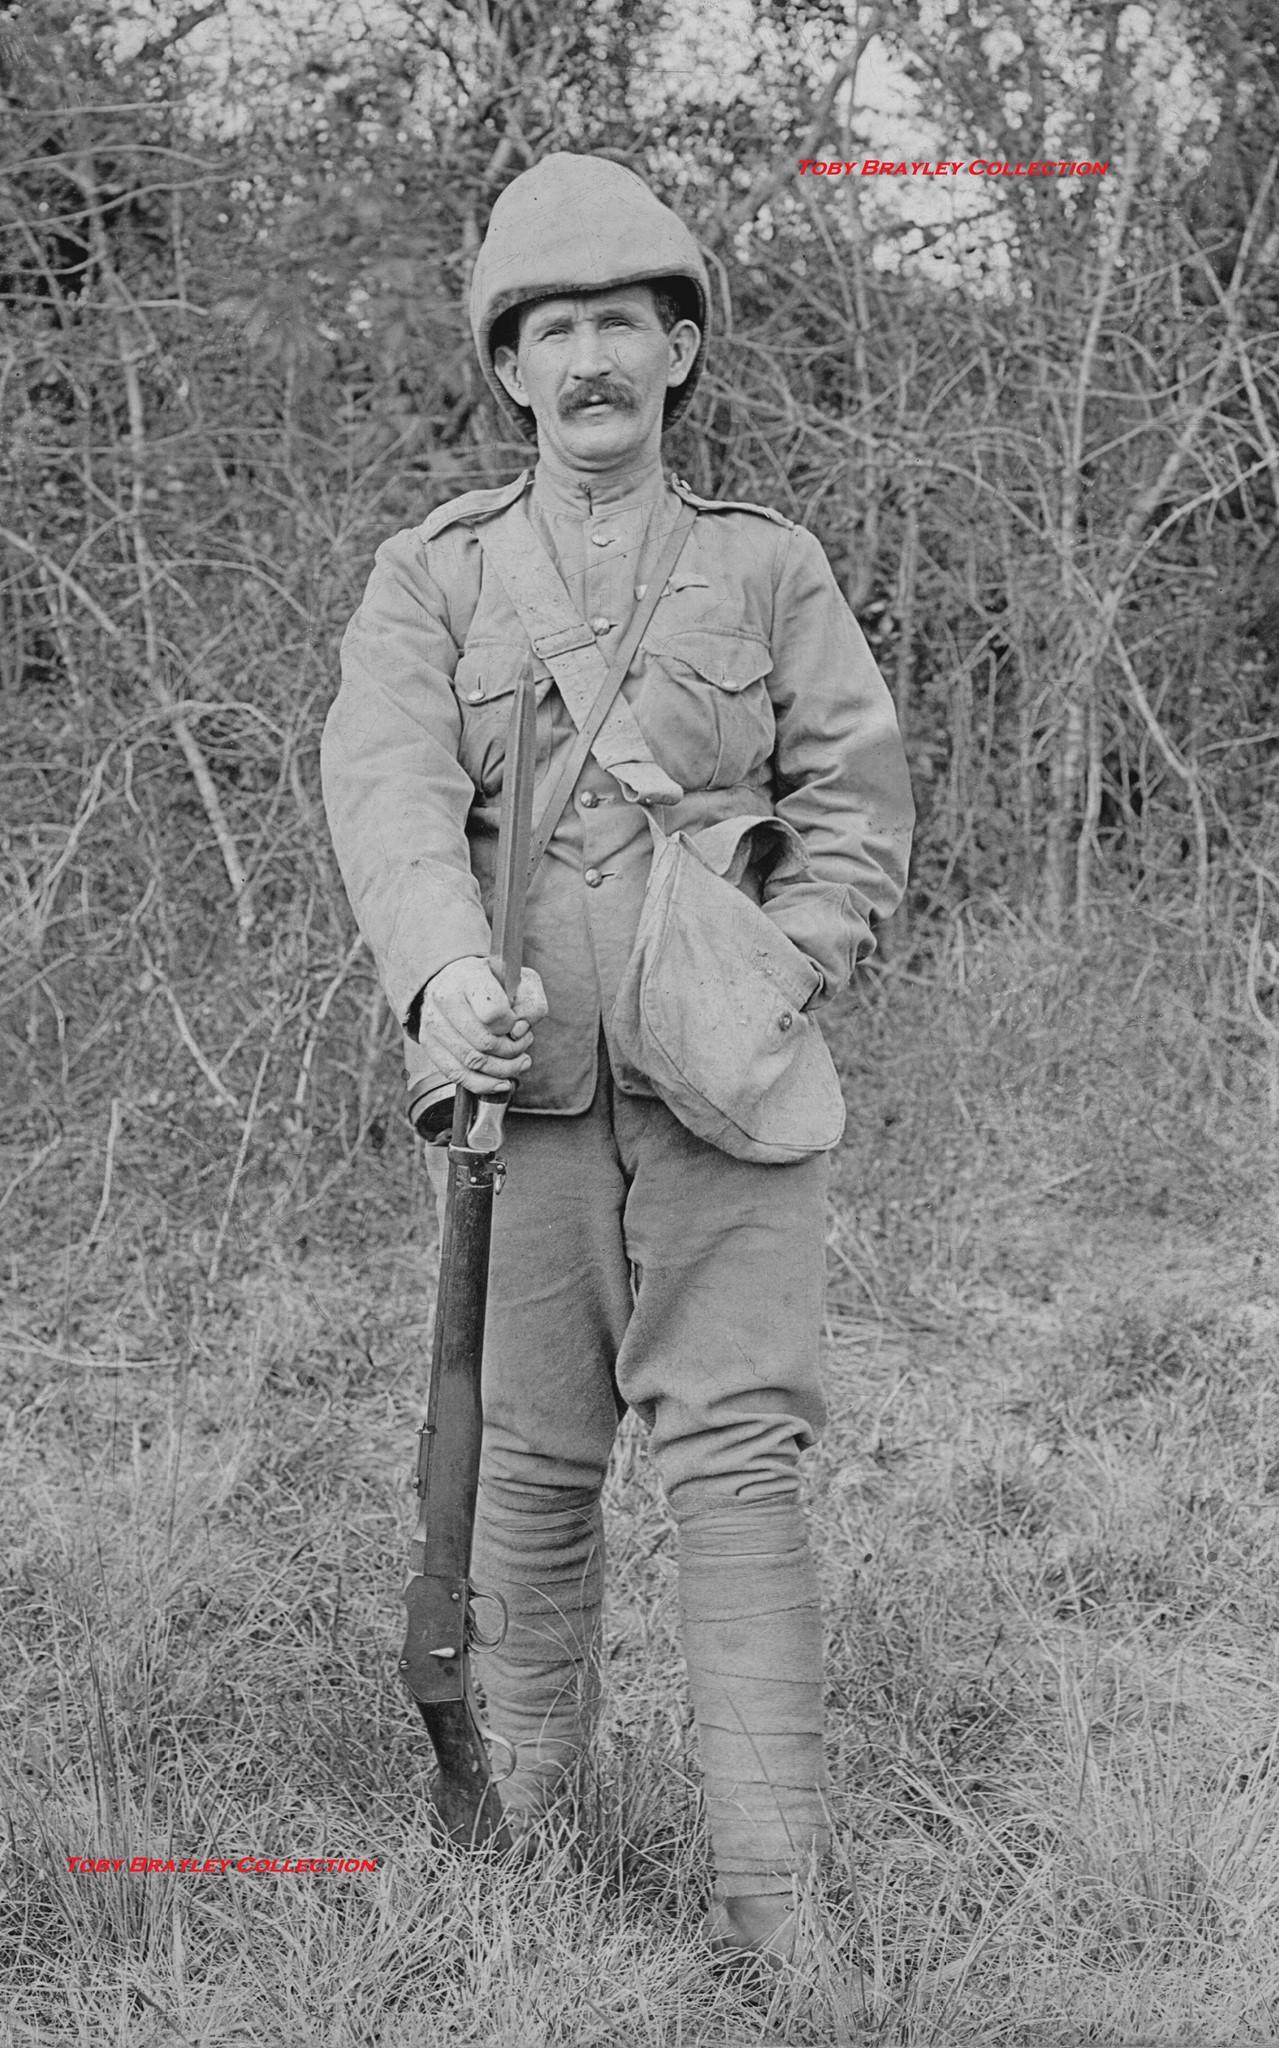 British artilleryman with 1888?